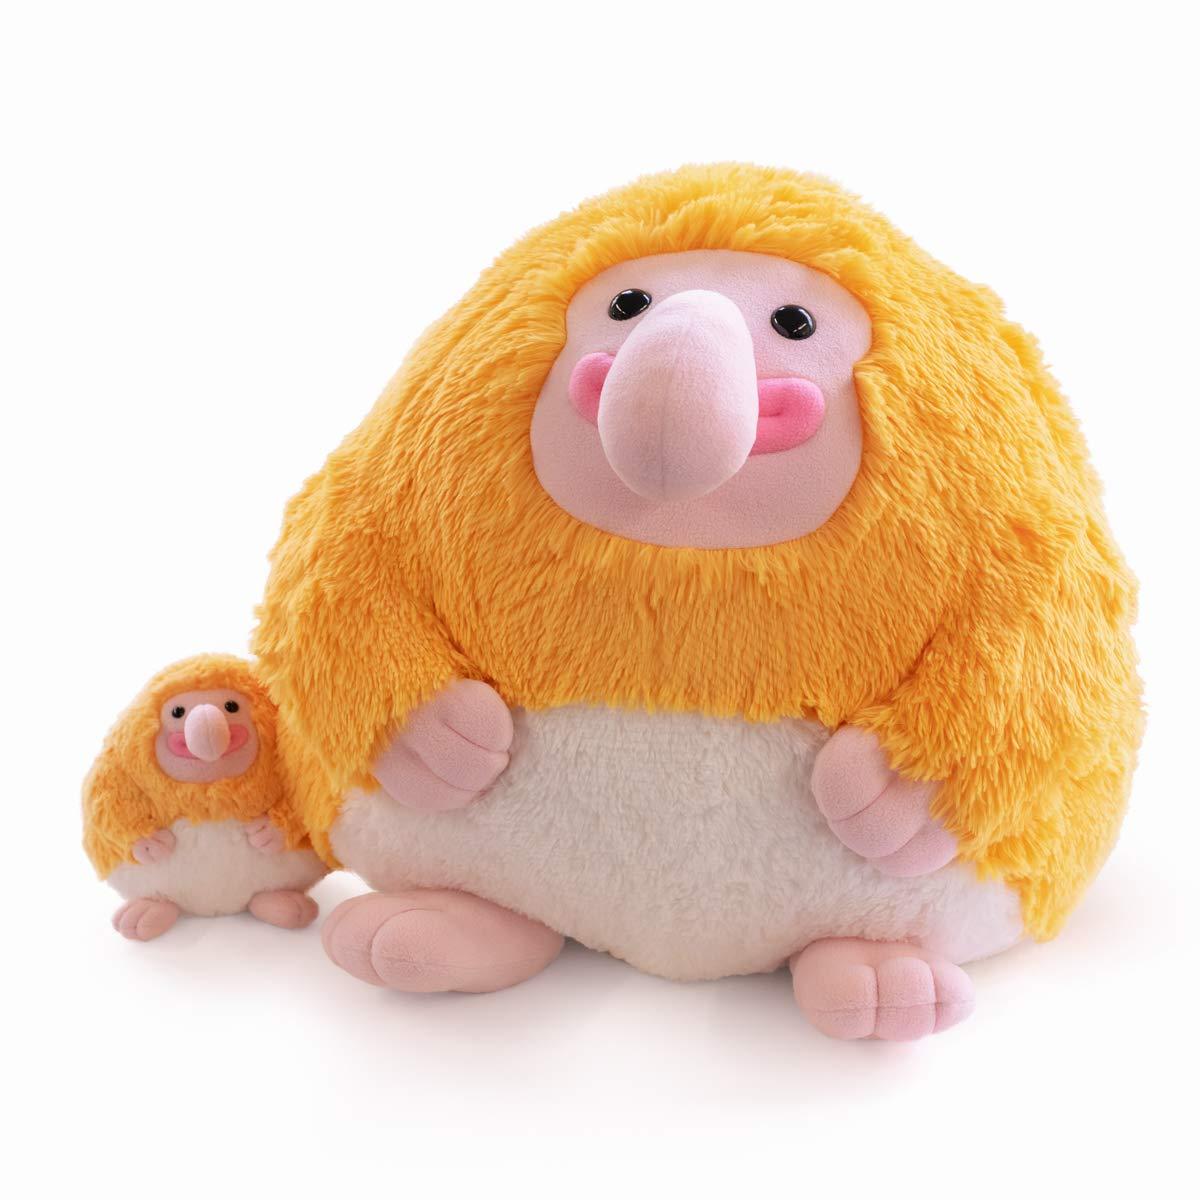 Hashtag Collectibles Colossal Proboscis Monkey Plush by Hashtag Collectibles